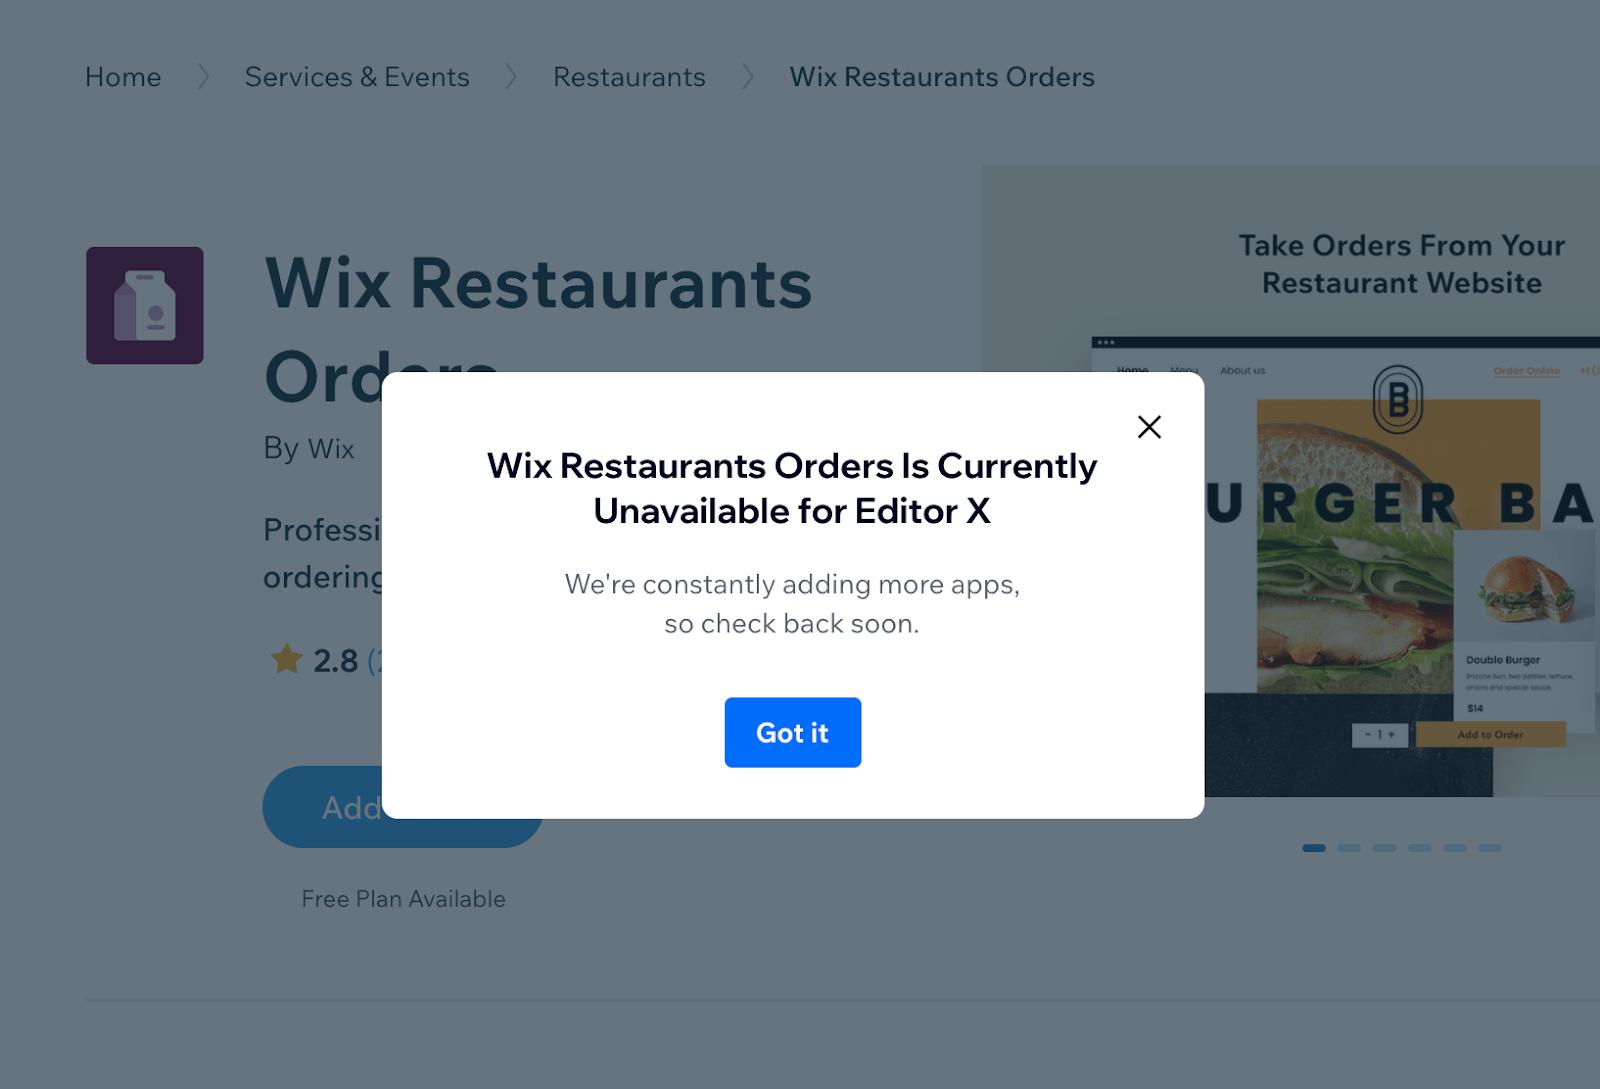 Editor X - Wix Restaurants Orders app